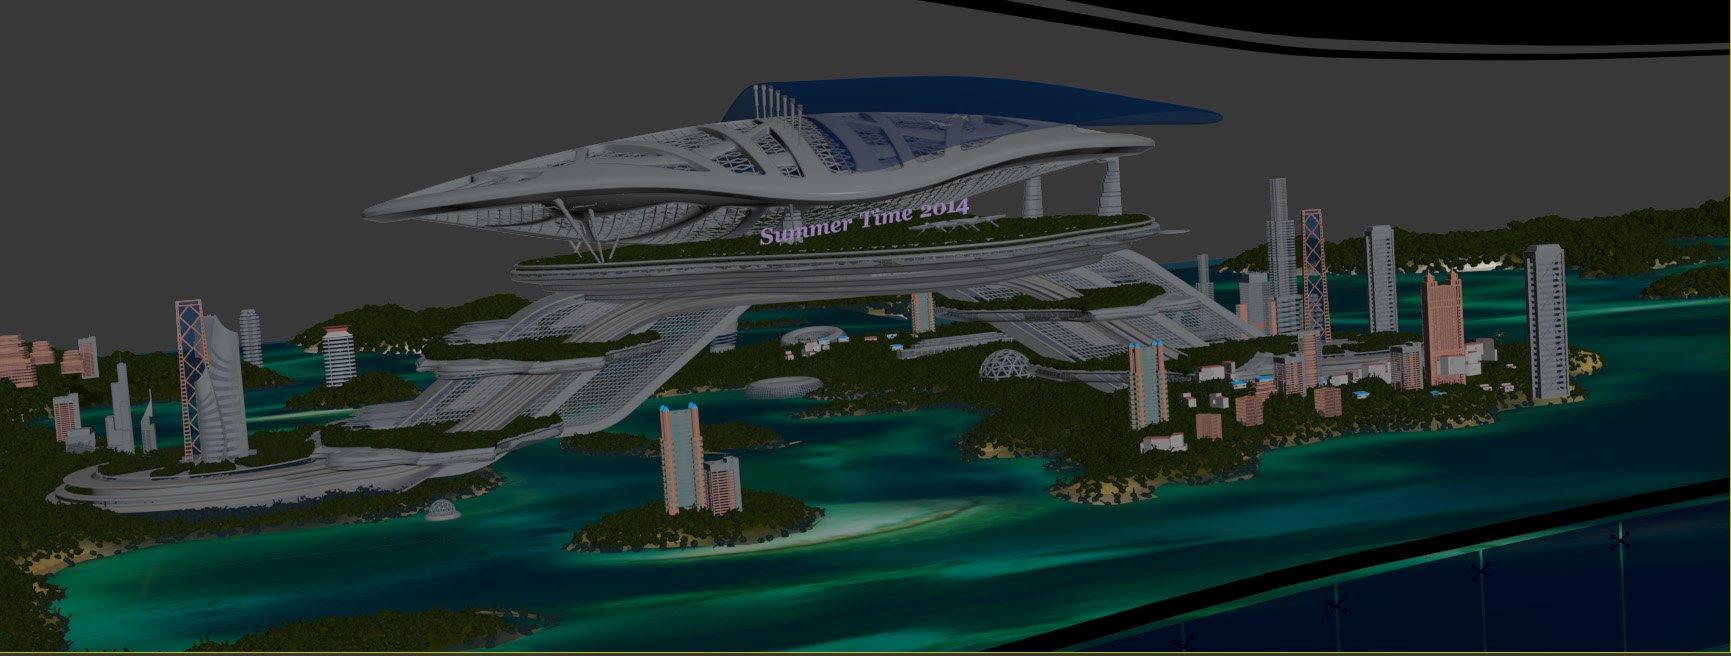 nr_04_city_model_view_127.jpg